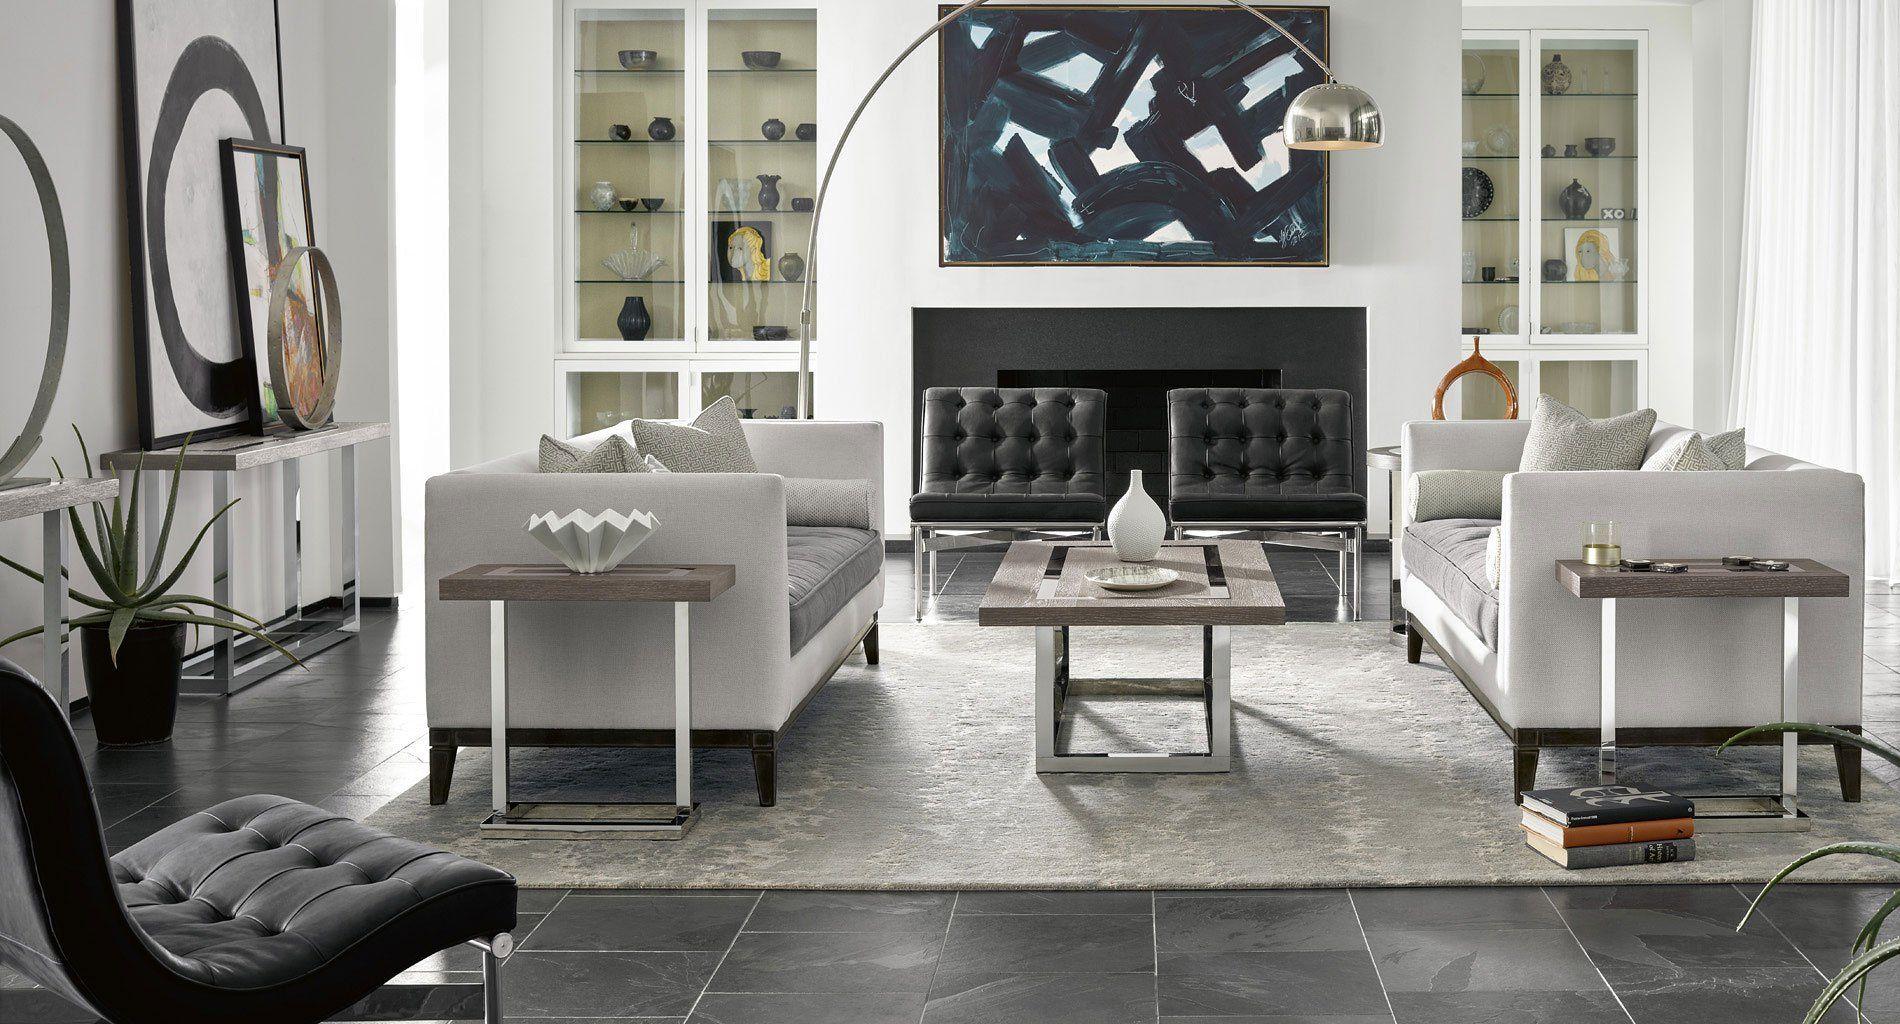 Monochrome Beauty Https Www Furniturecart Com Modern Wyatt Occasional Table Set Flint 645810 645802 Universal Furniture Html Home Home Decor Decor